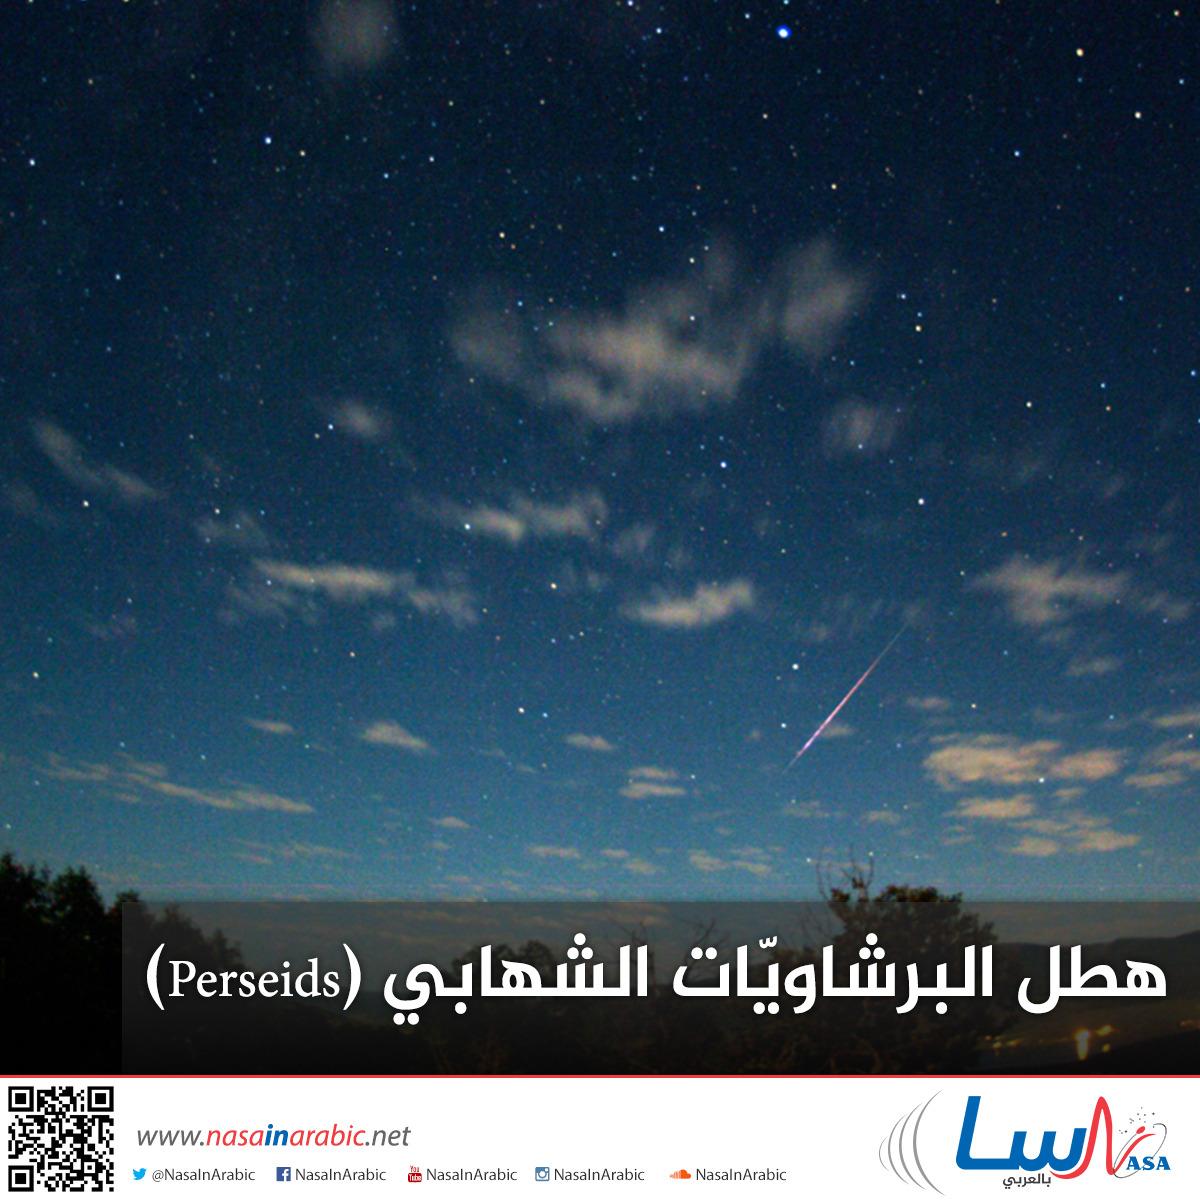 هطل البرشاويّات الشهابي (Perseids)